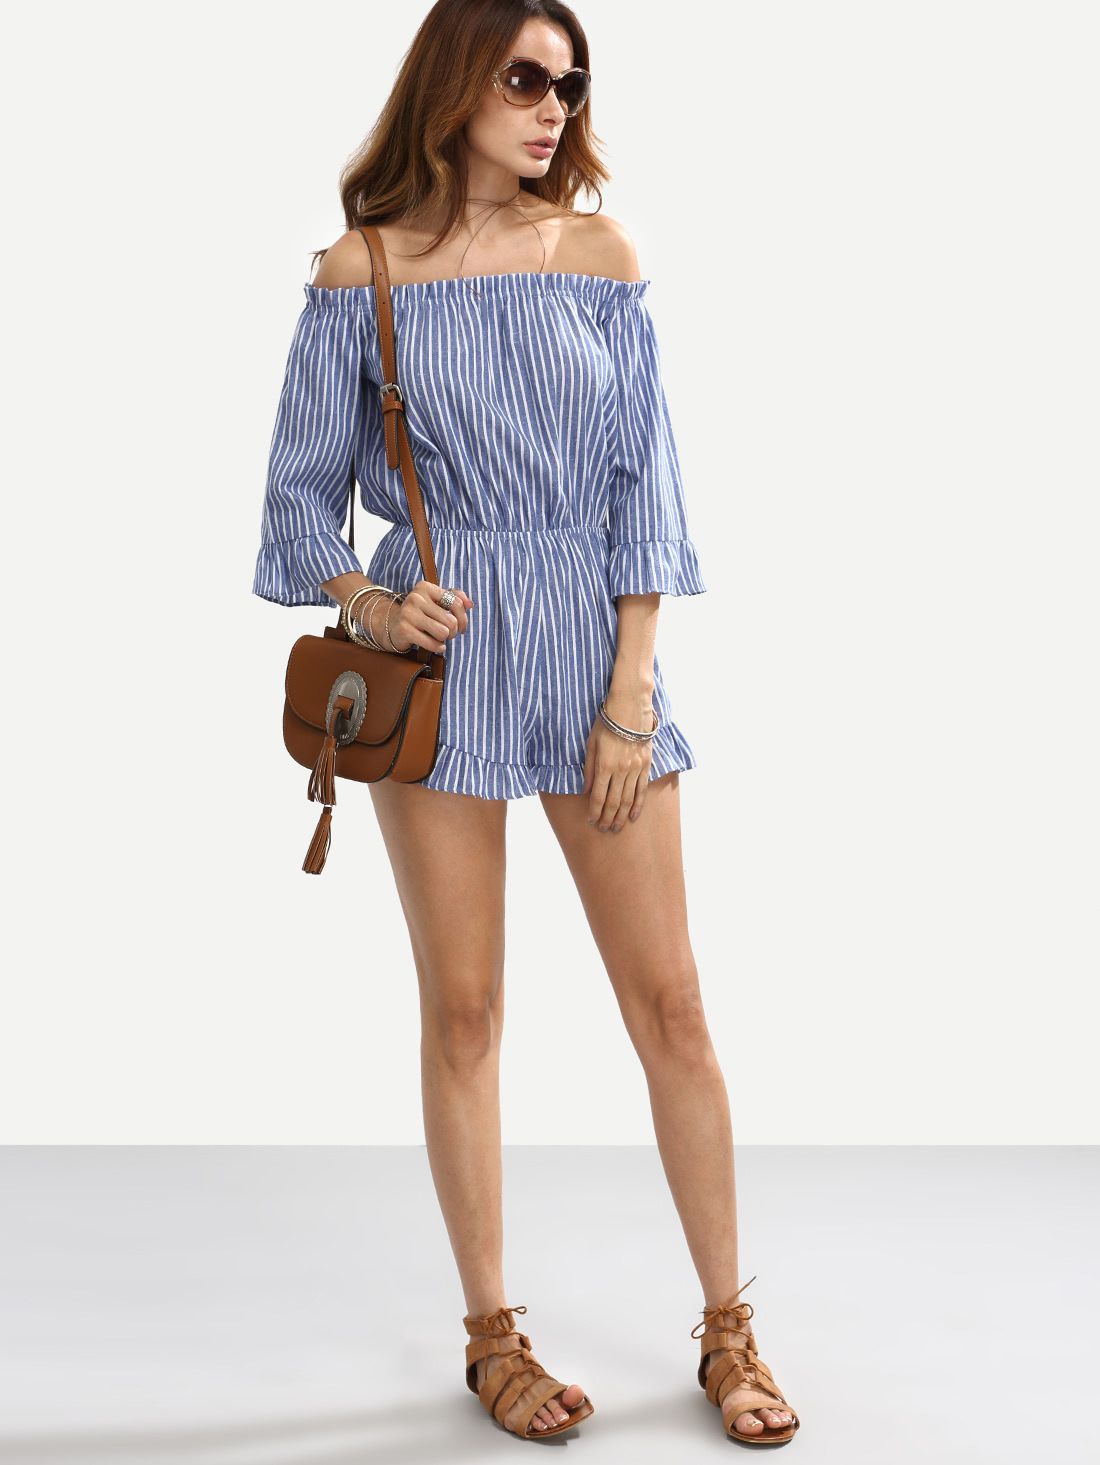 5a5d6d2e299 Shop Striped Off The Shoulder Flounce Jumpsuit online. SheIn offers Striped  Off The Shoulder Flounce Jumpsuit   more to fit your fashionable needs.